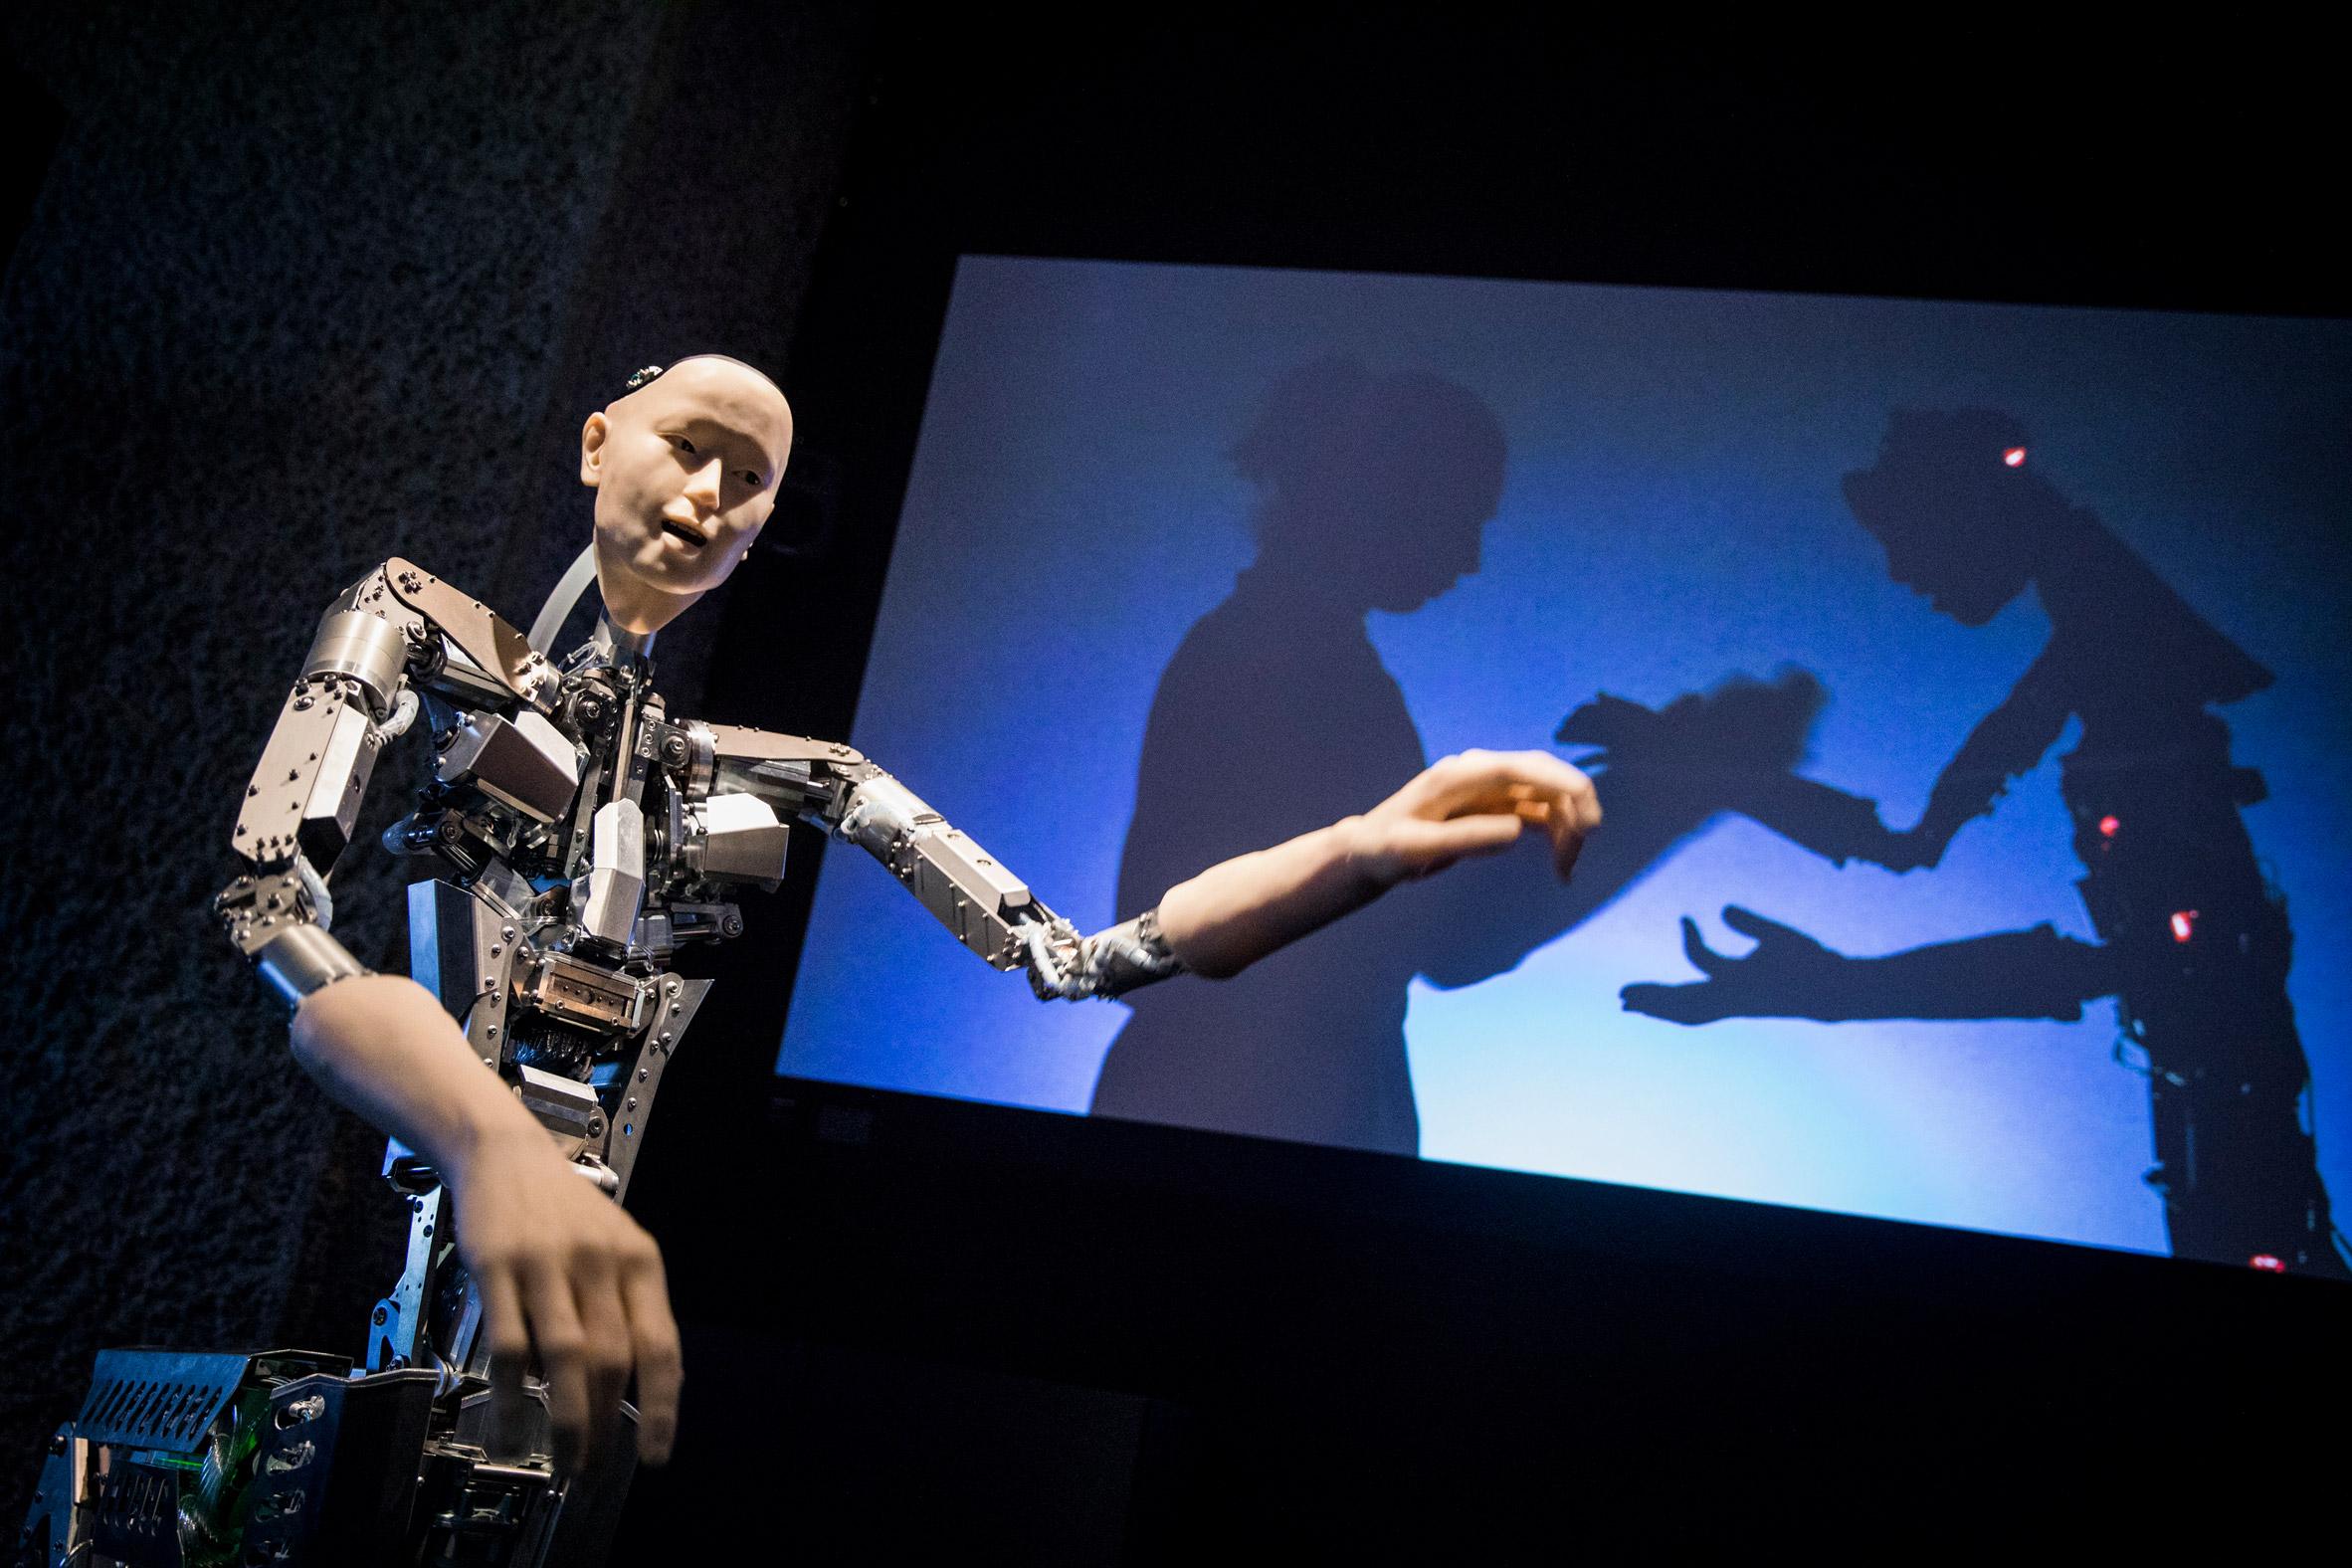 Barbican AI More than Human exhibition